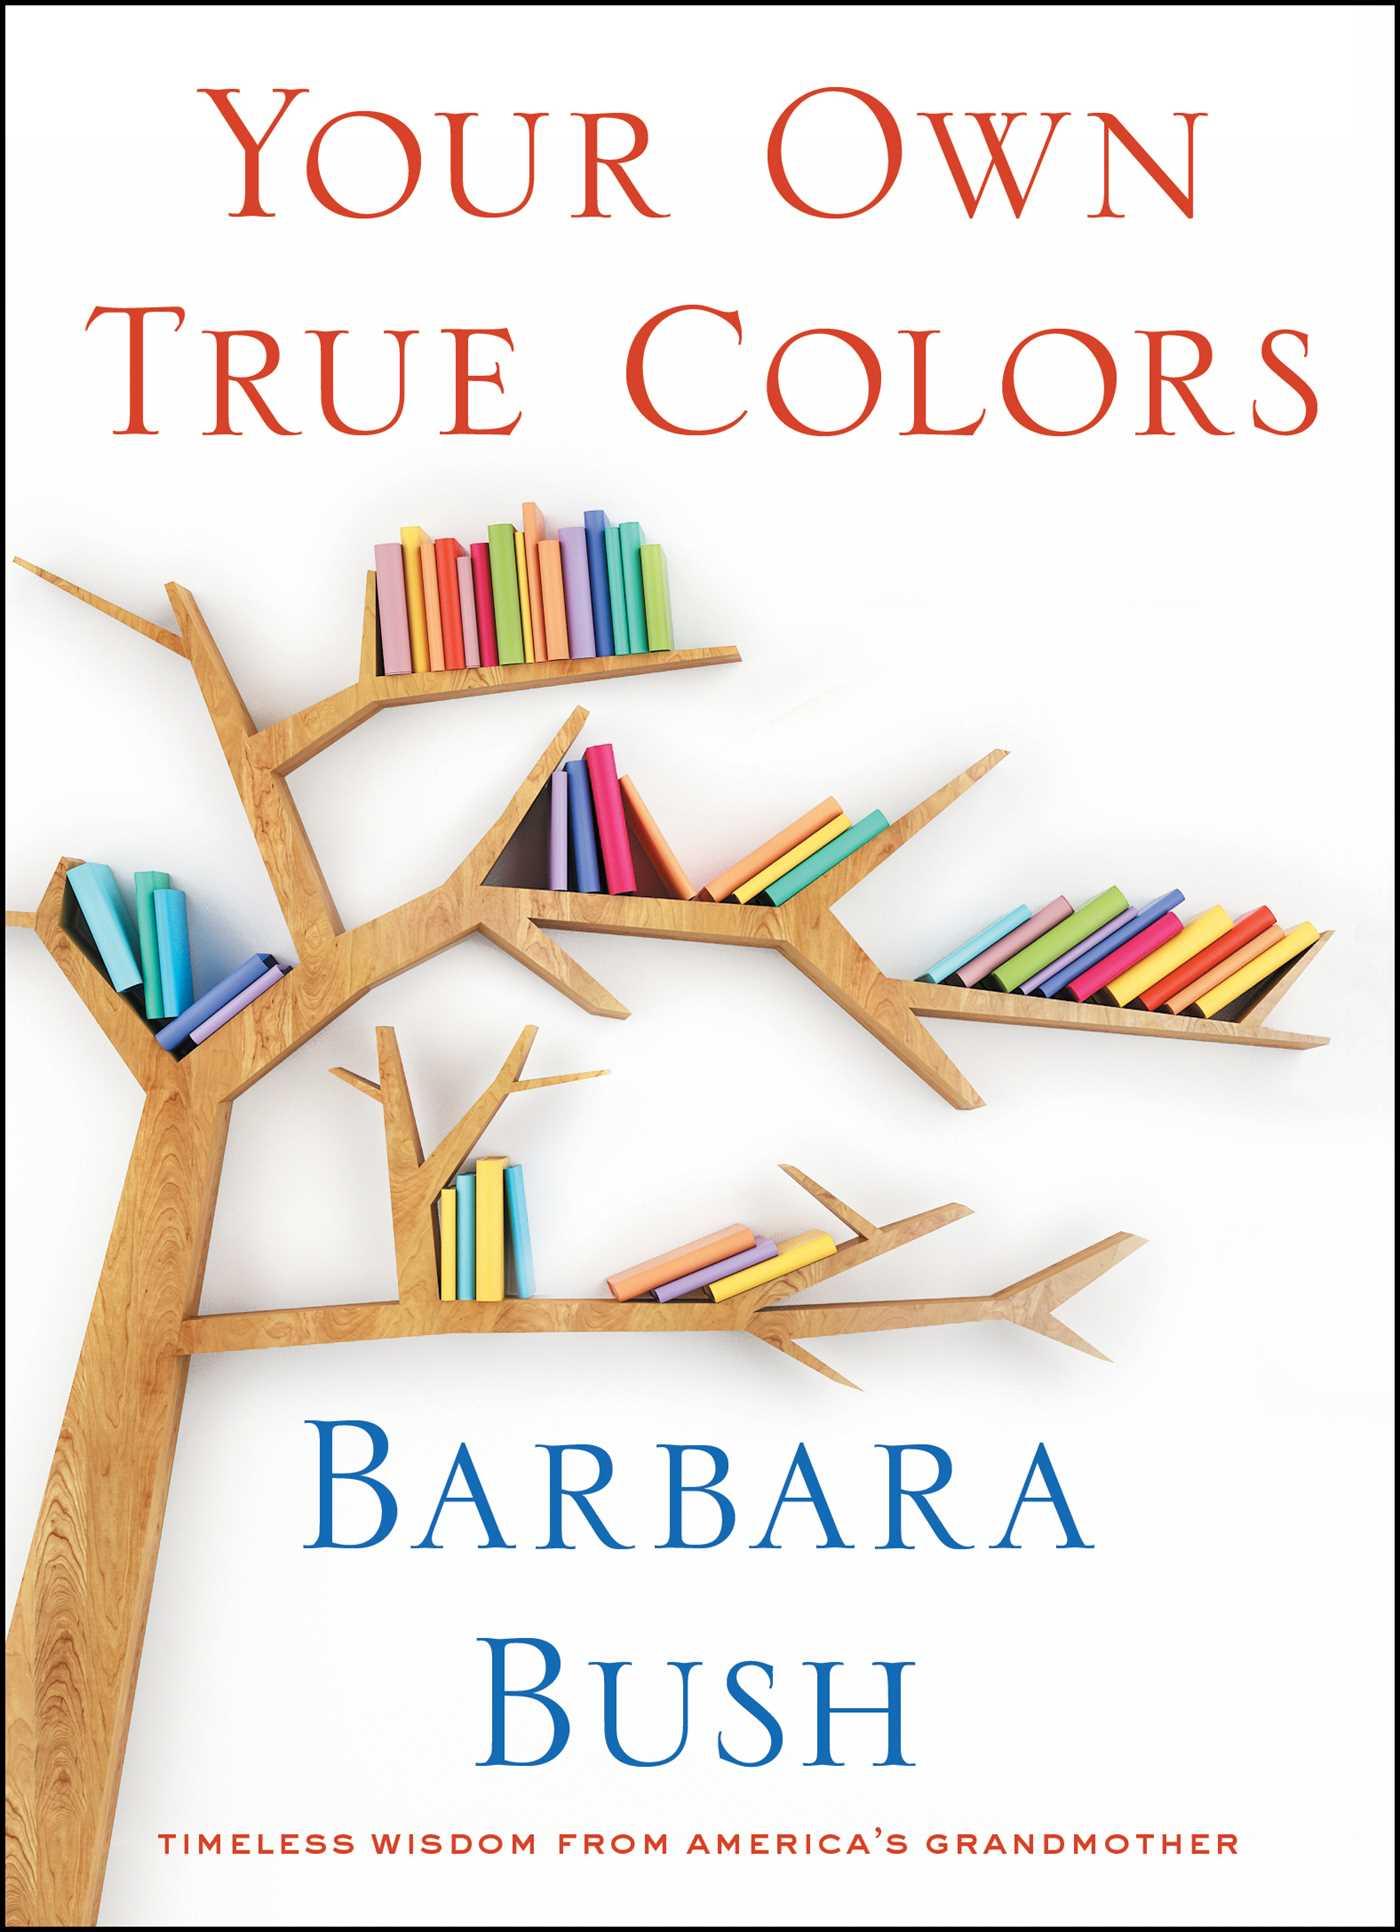 Your own true colors 9781982109530 hr